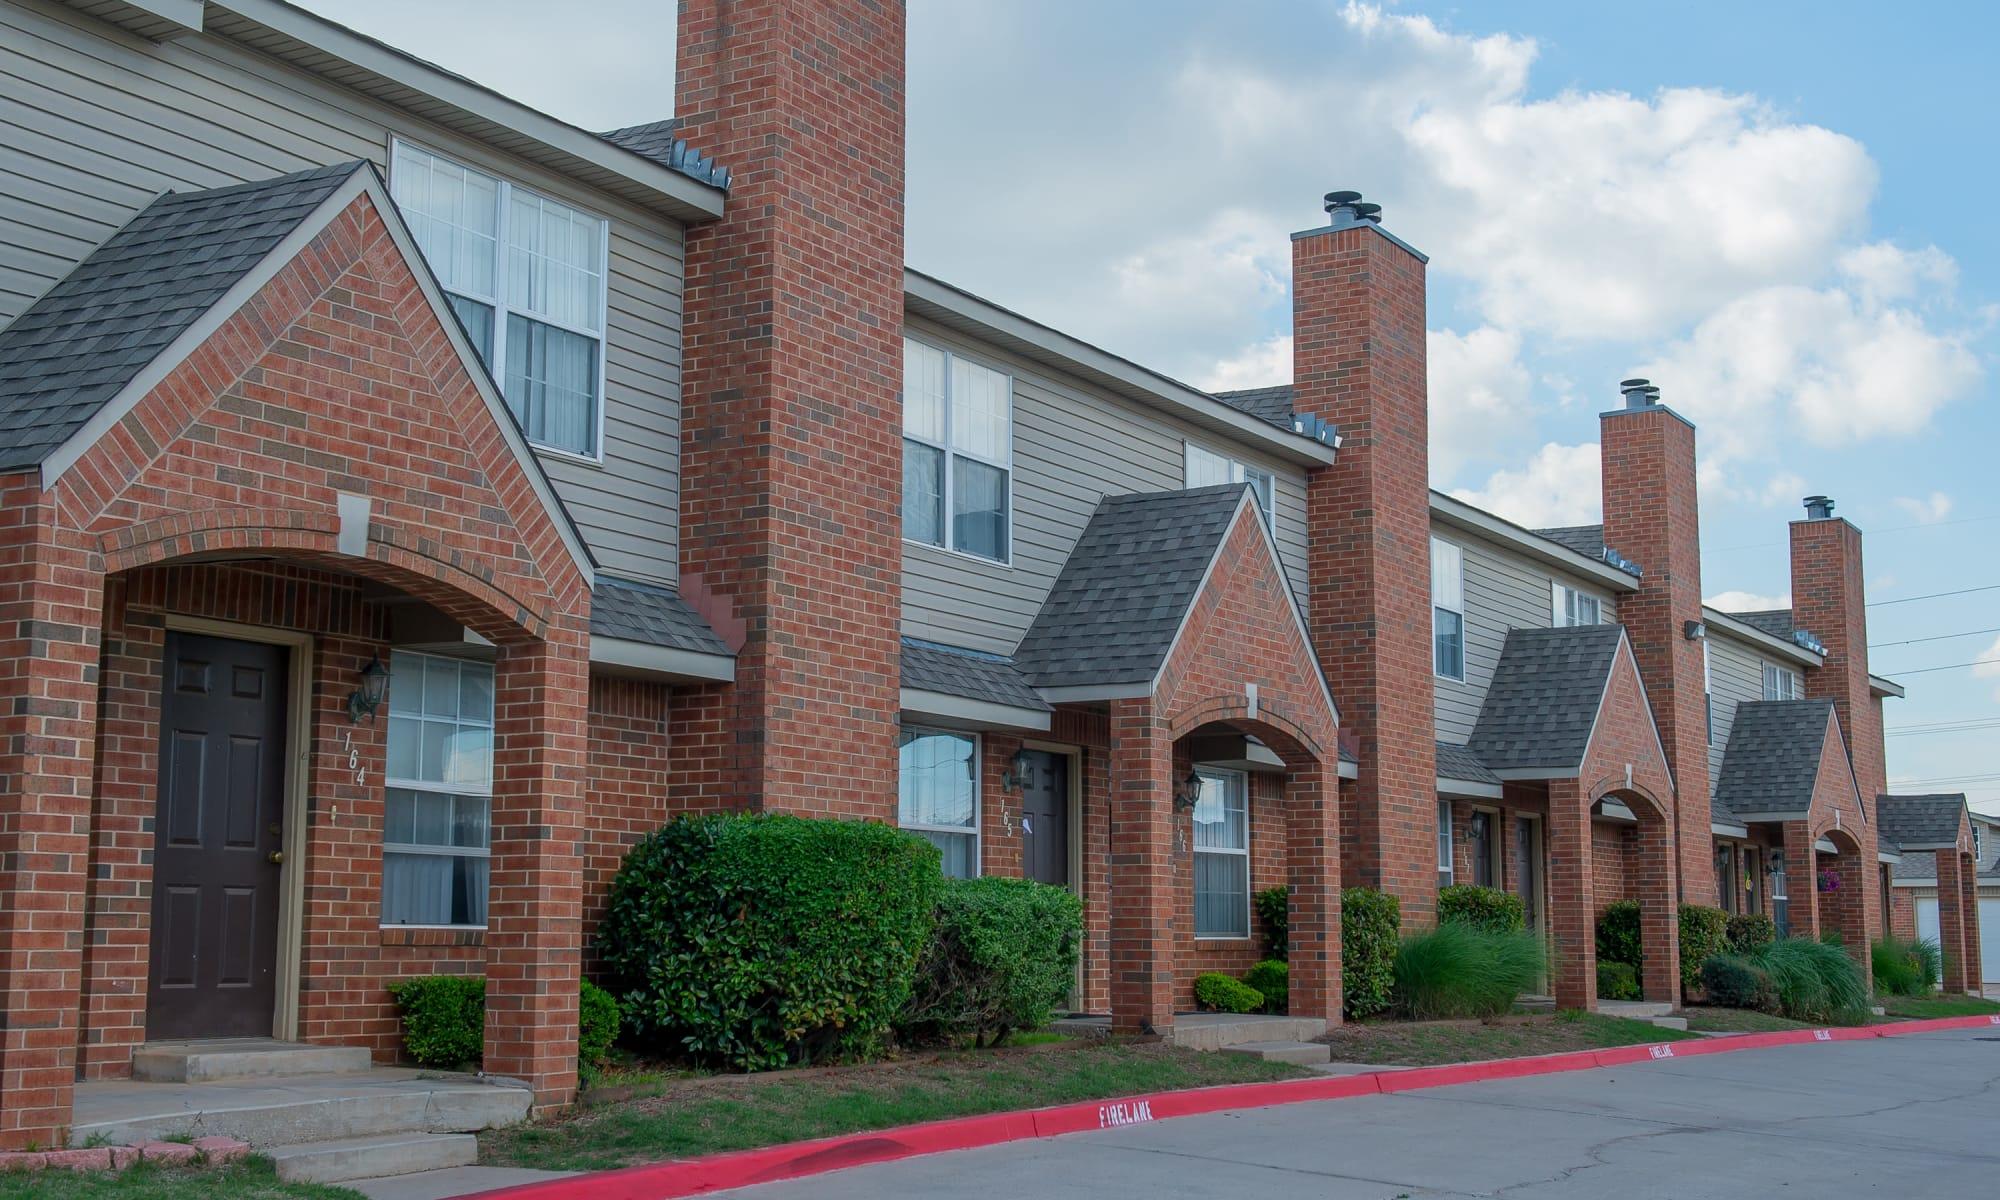 Persimmon Square Apartments in Oklahoma City, Oklahoma